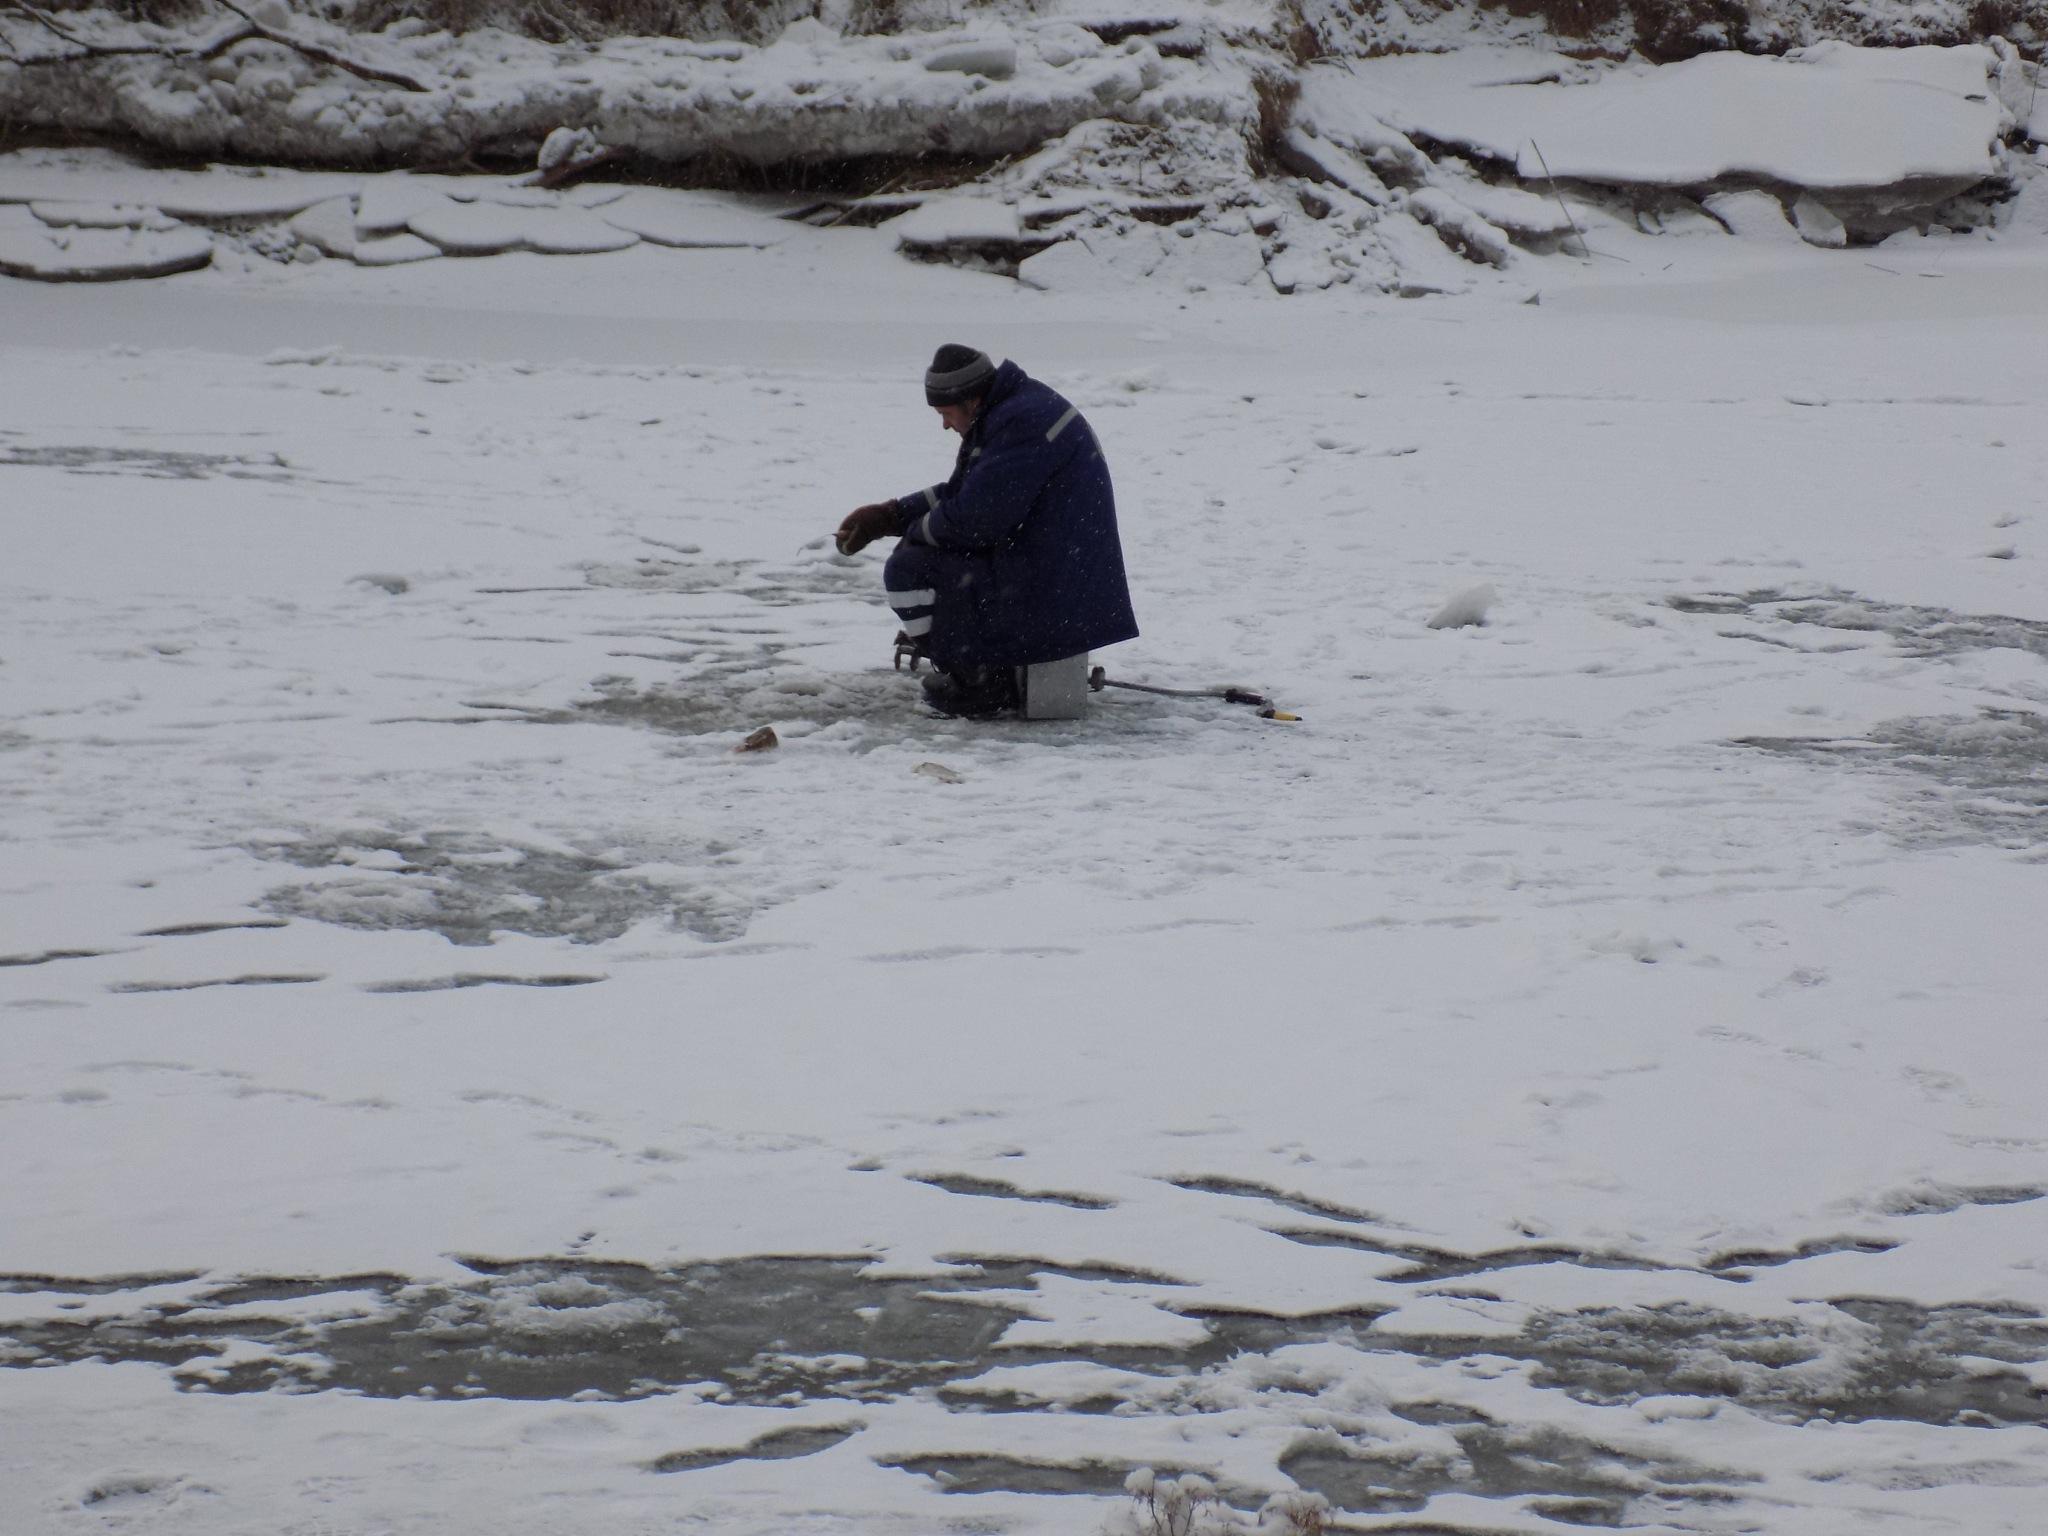 Fisherman by uzkuraitiene62